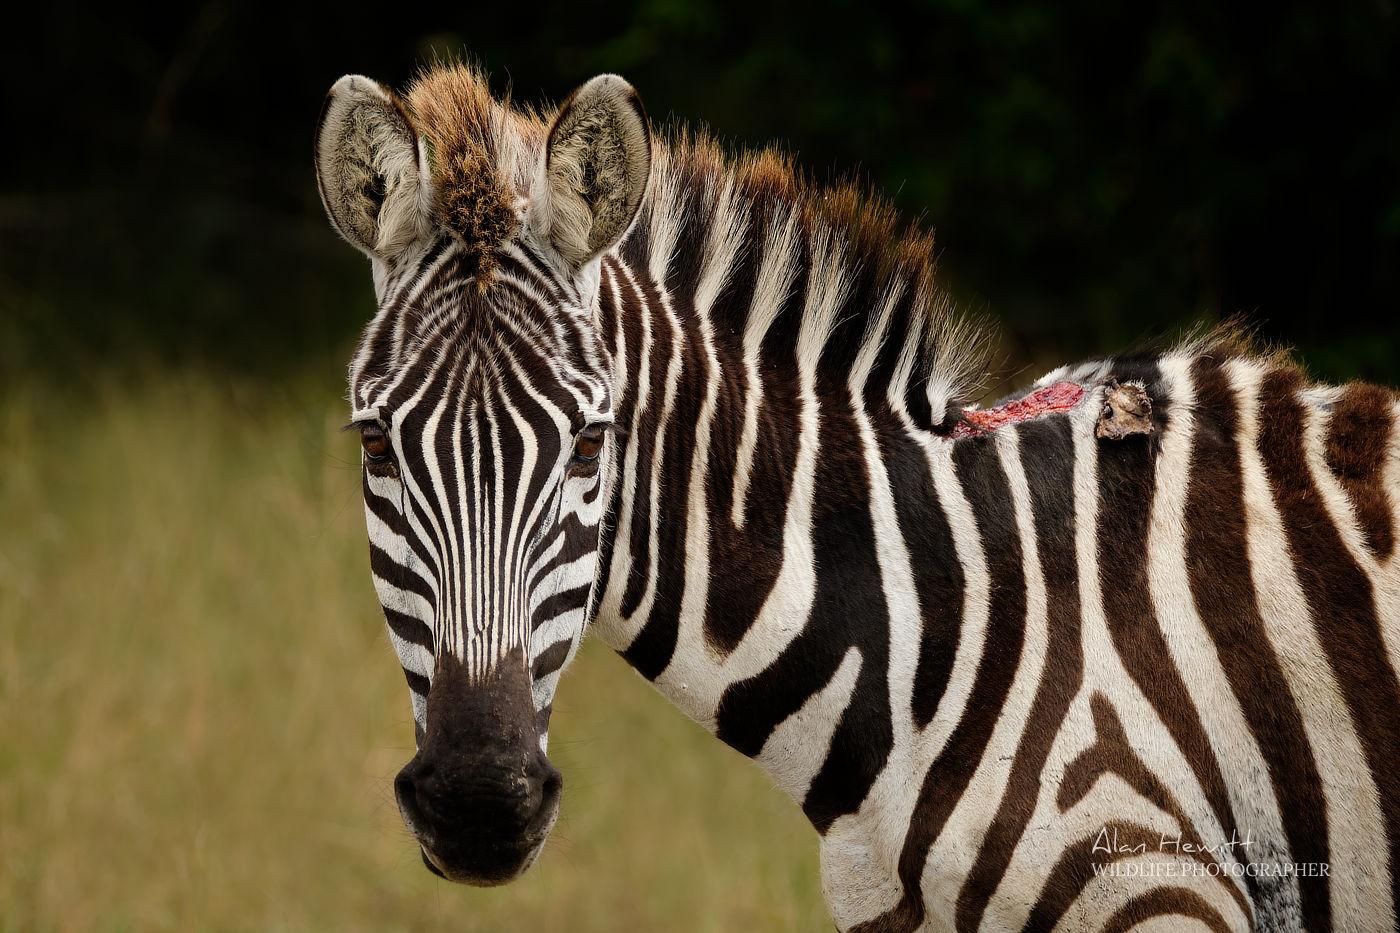 Injured Zebra Alan Hewitt Photography